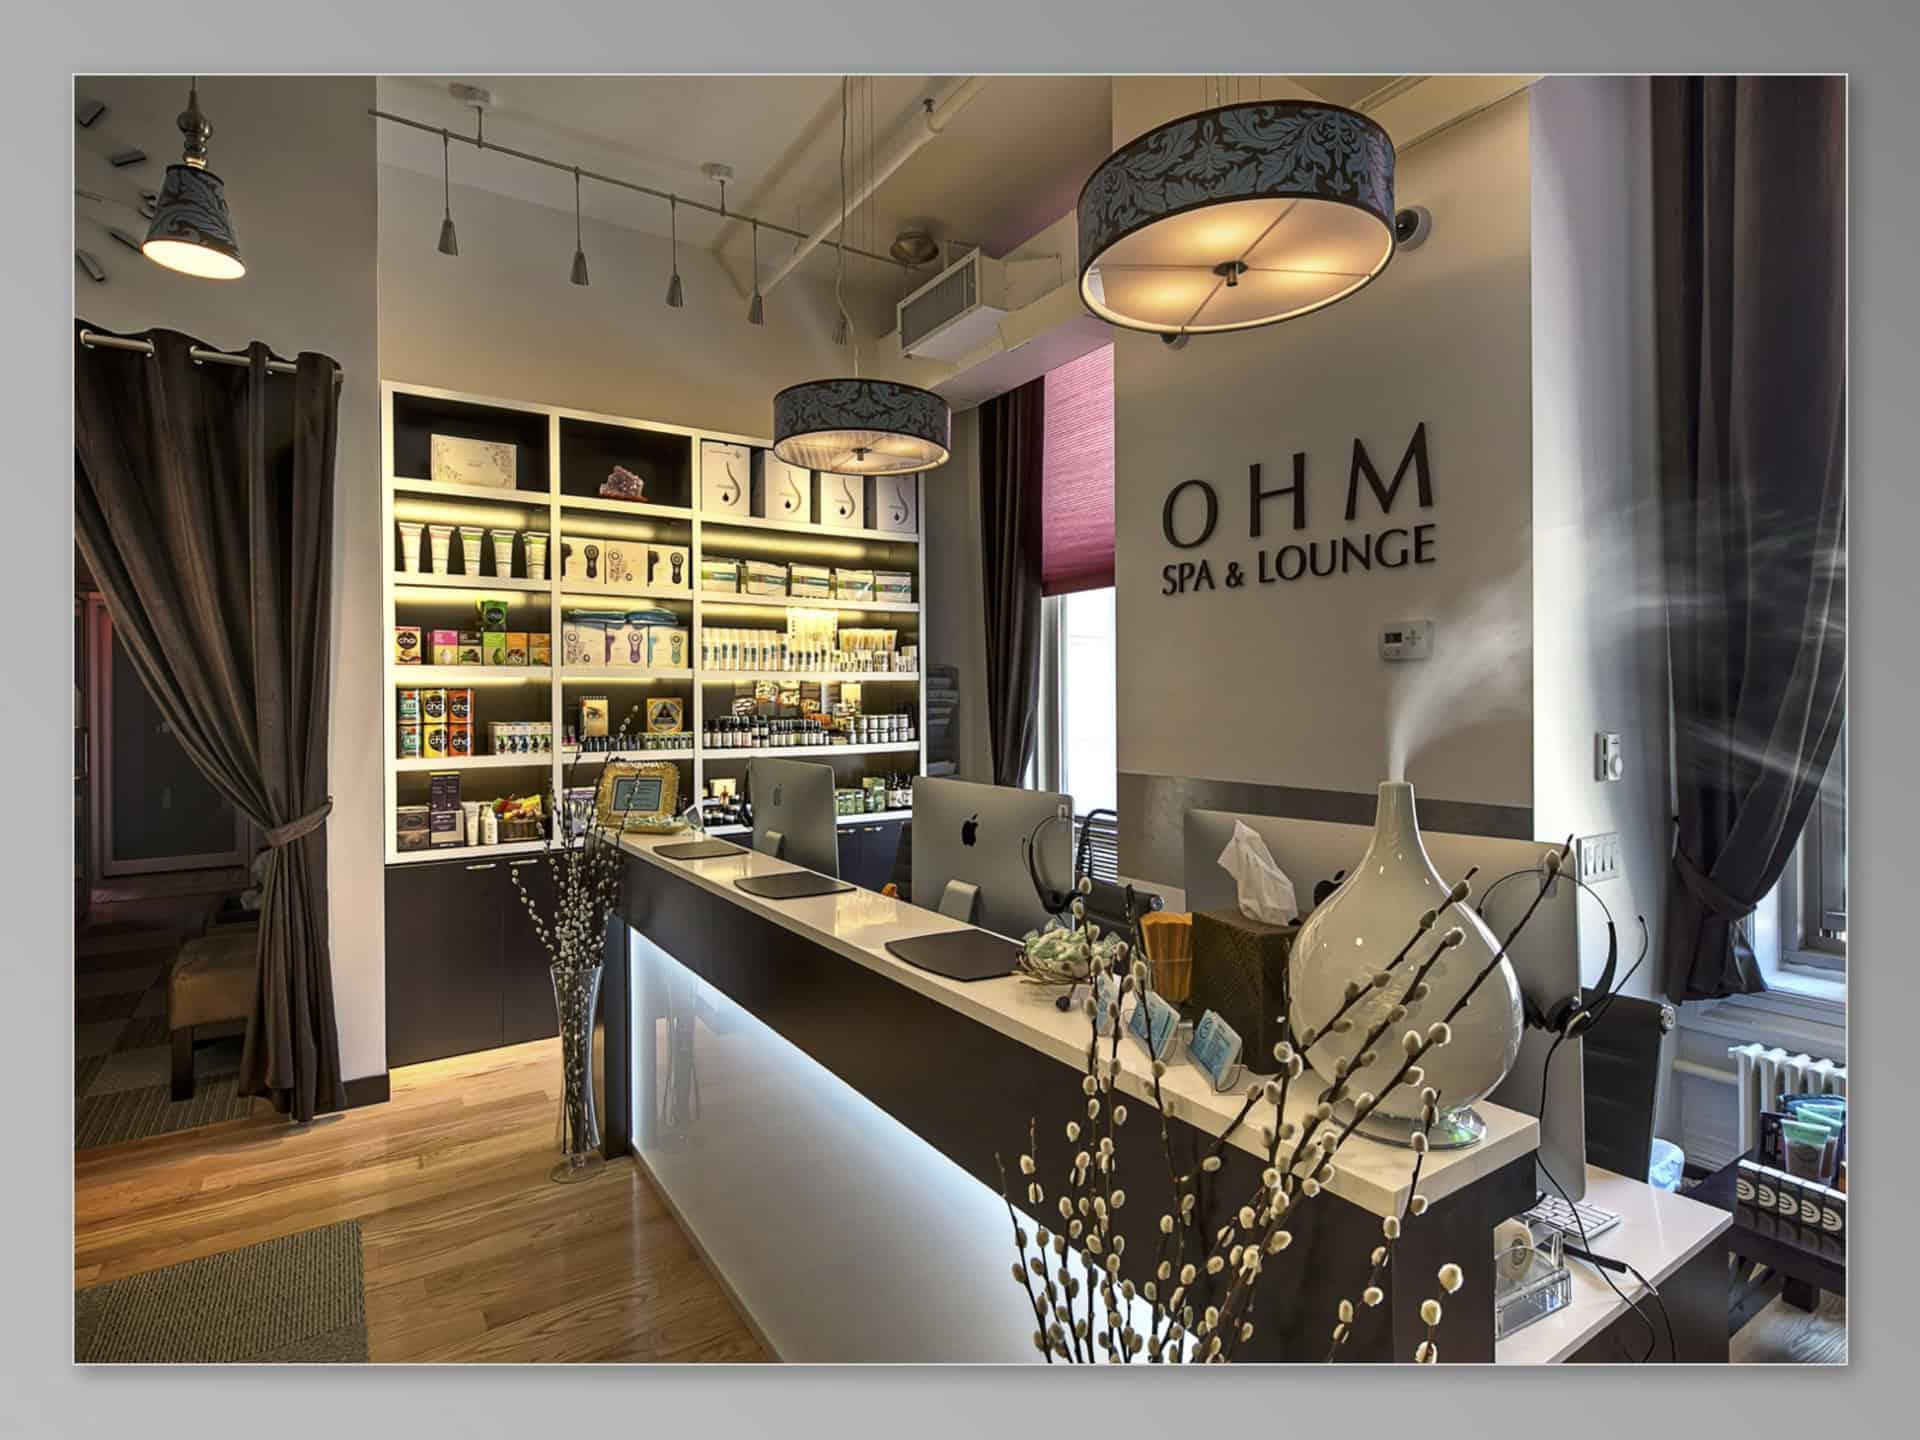 Ohm Spa Photo Gallery - Custom Massage, Expert Facial